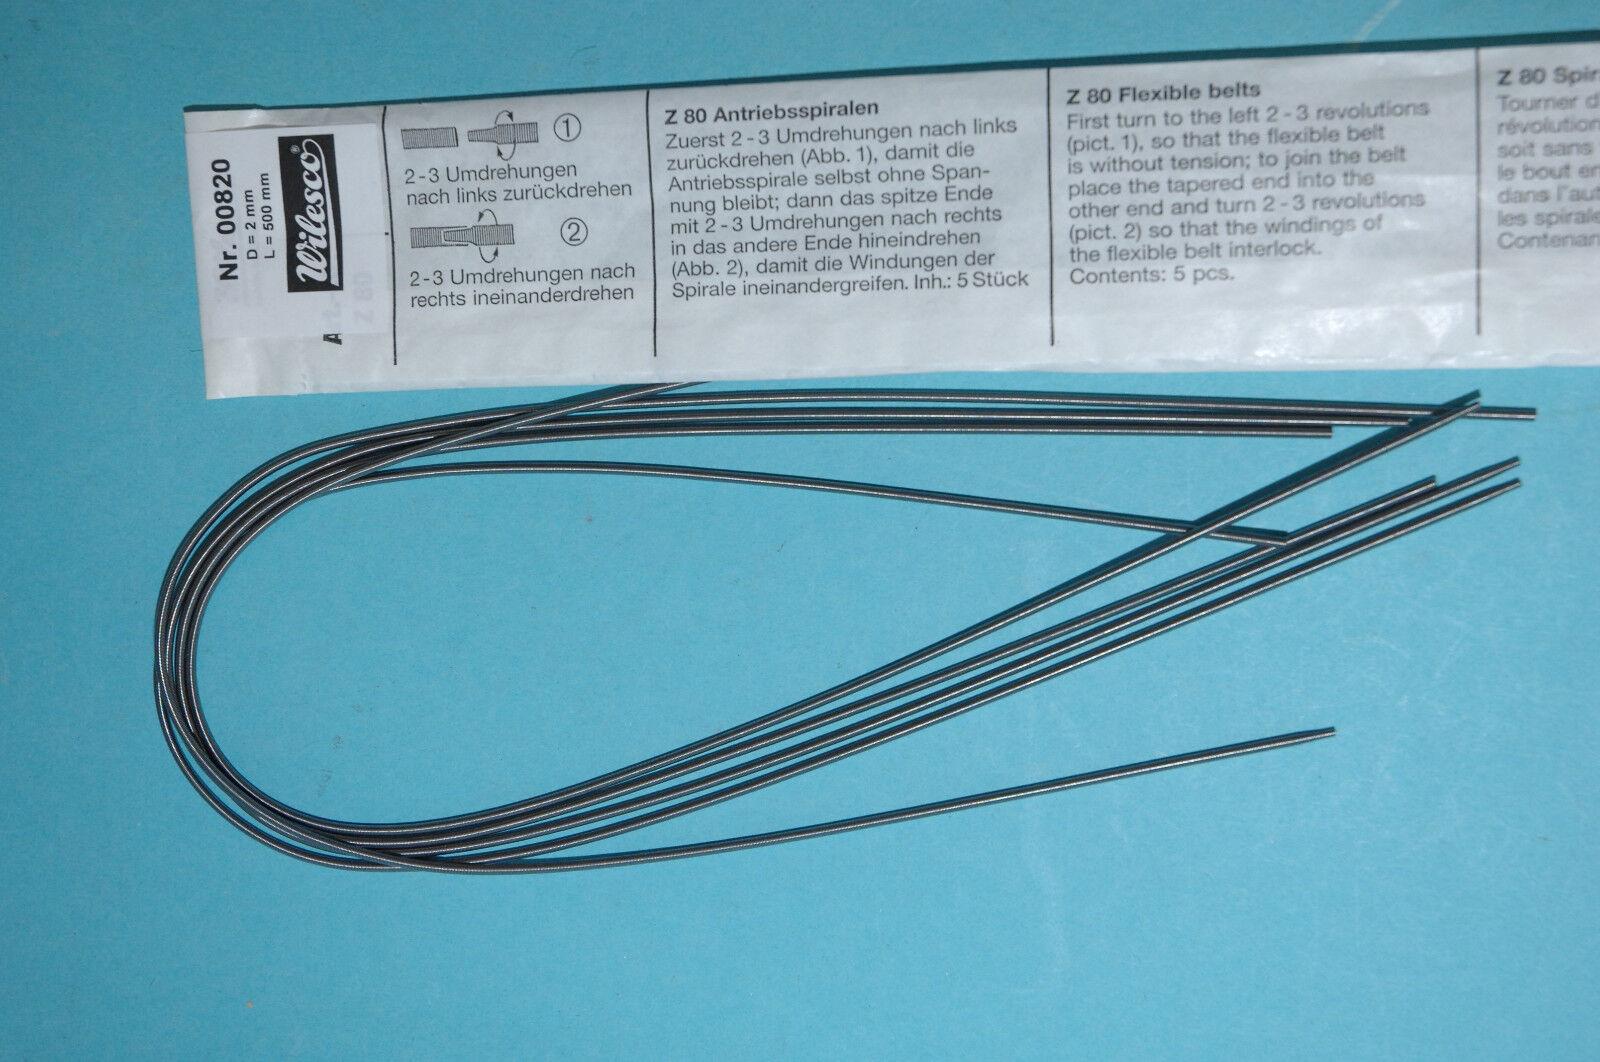 New Toys, Hobbies Wilesco Z80 5 X Flexible Belts 2 Mm X 260 Mm